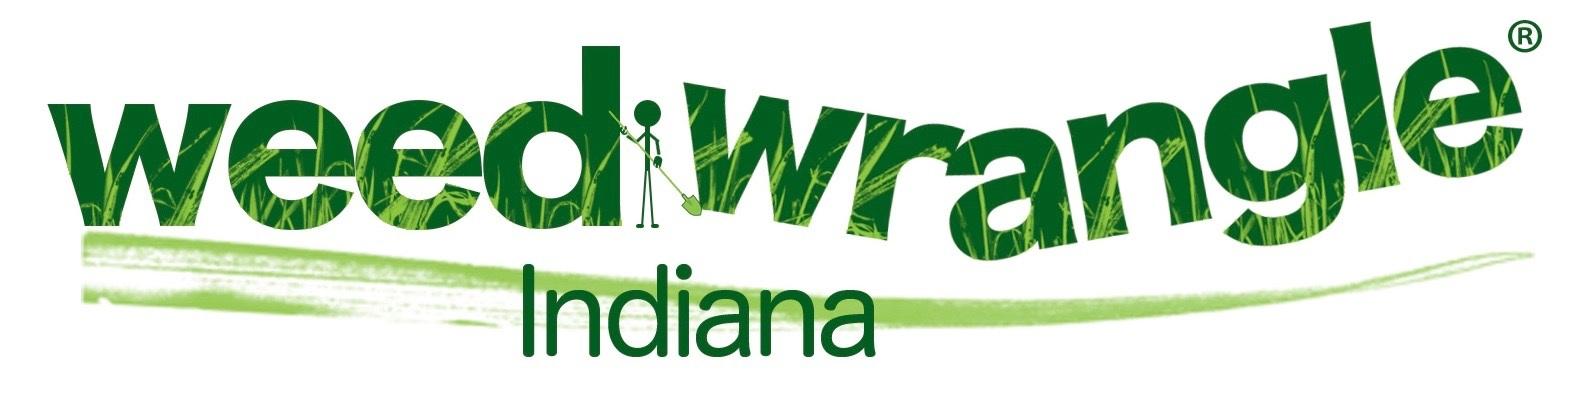 WeedWrangle_Indiana+copy+%282%29.jpg